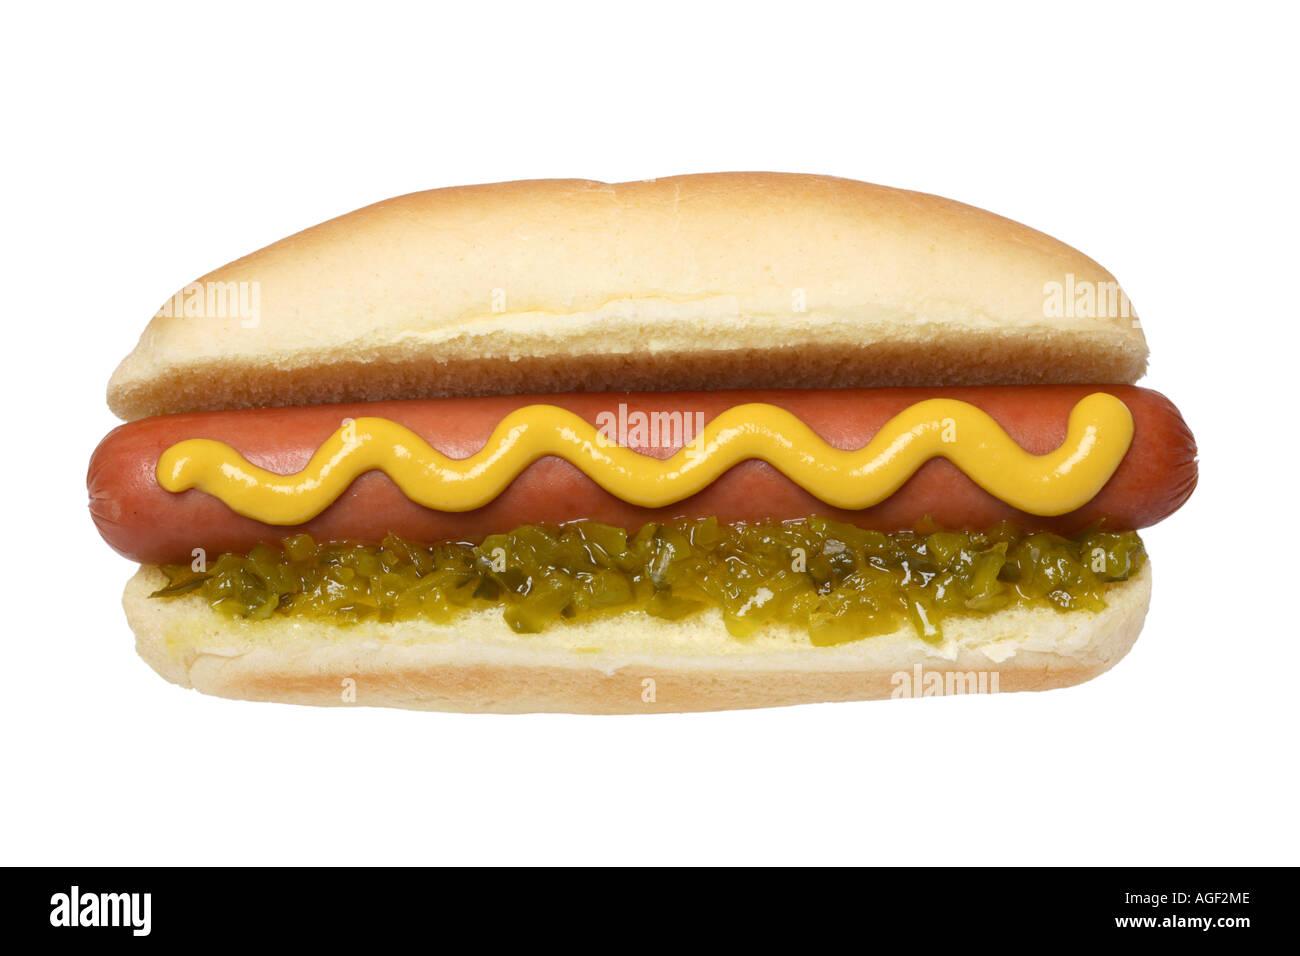 Hotdog with mustard and relish - Stock Image